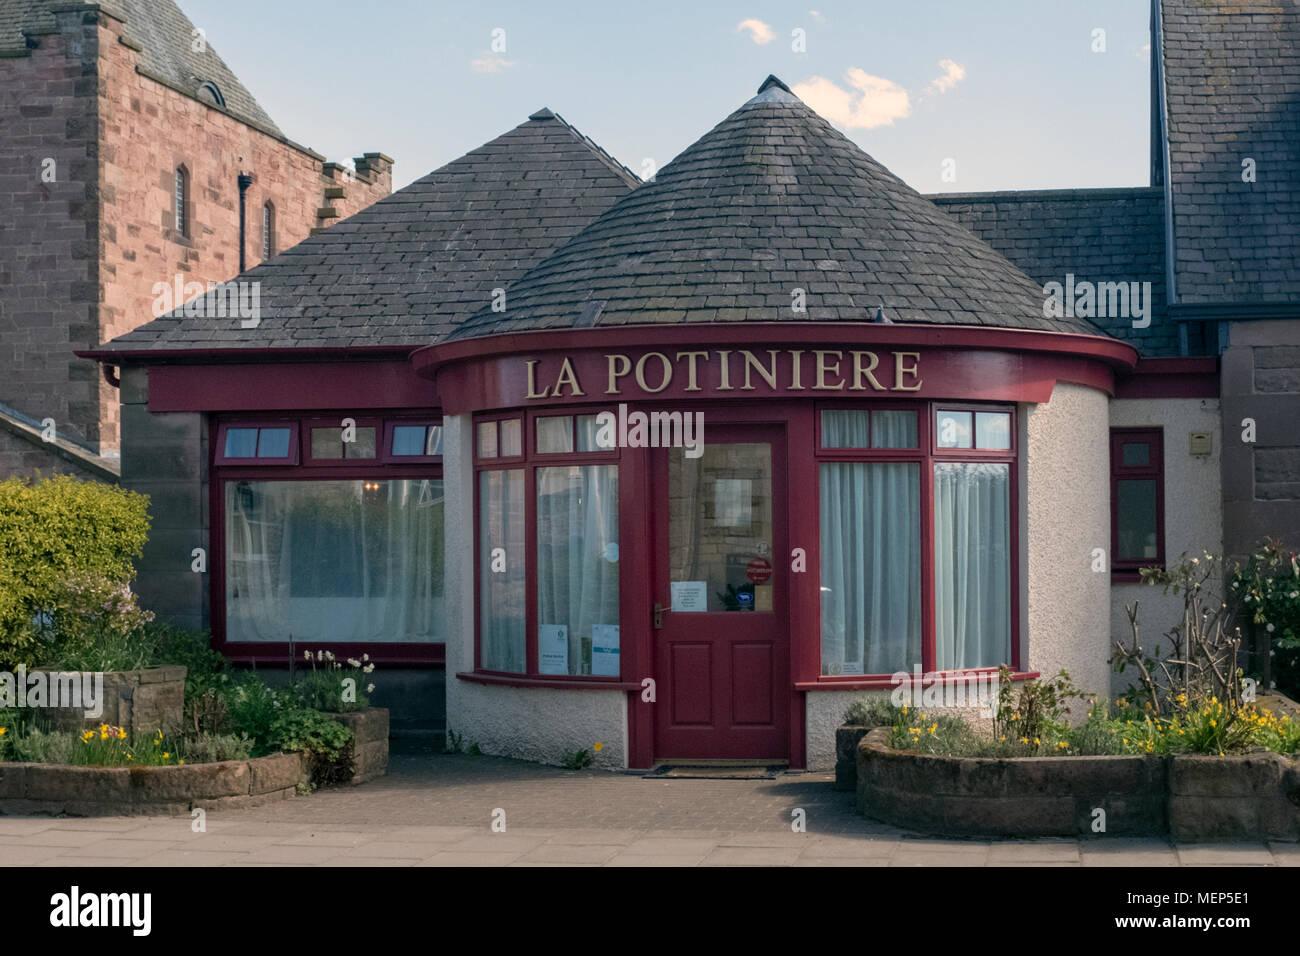 La Potiniere Restaurant, Gullane, East Lothian, Schottland Stockbild